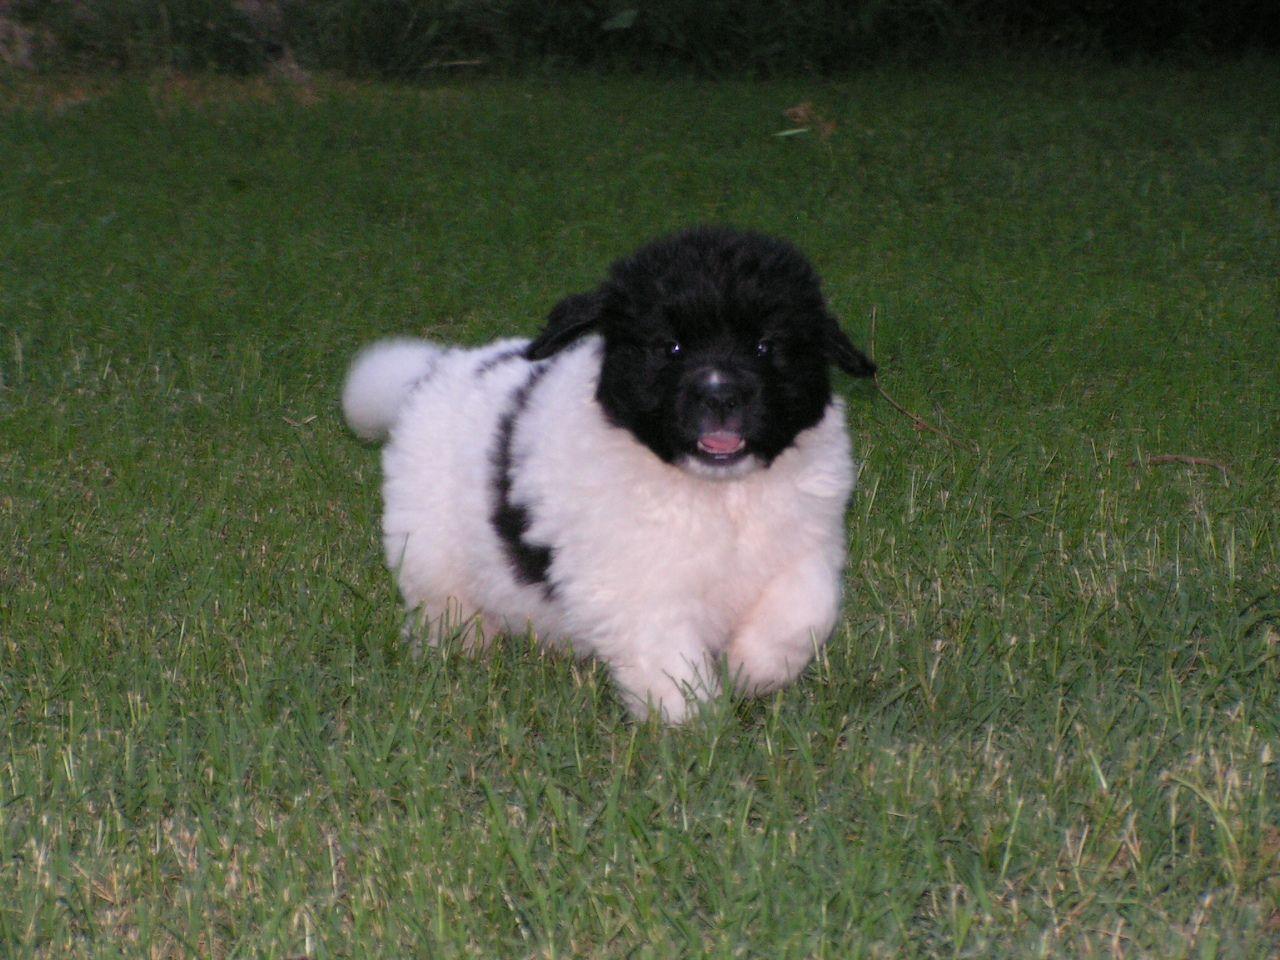 'Morse' at 6weeks - Newfoundland puppy